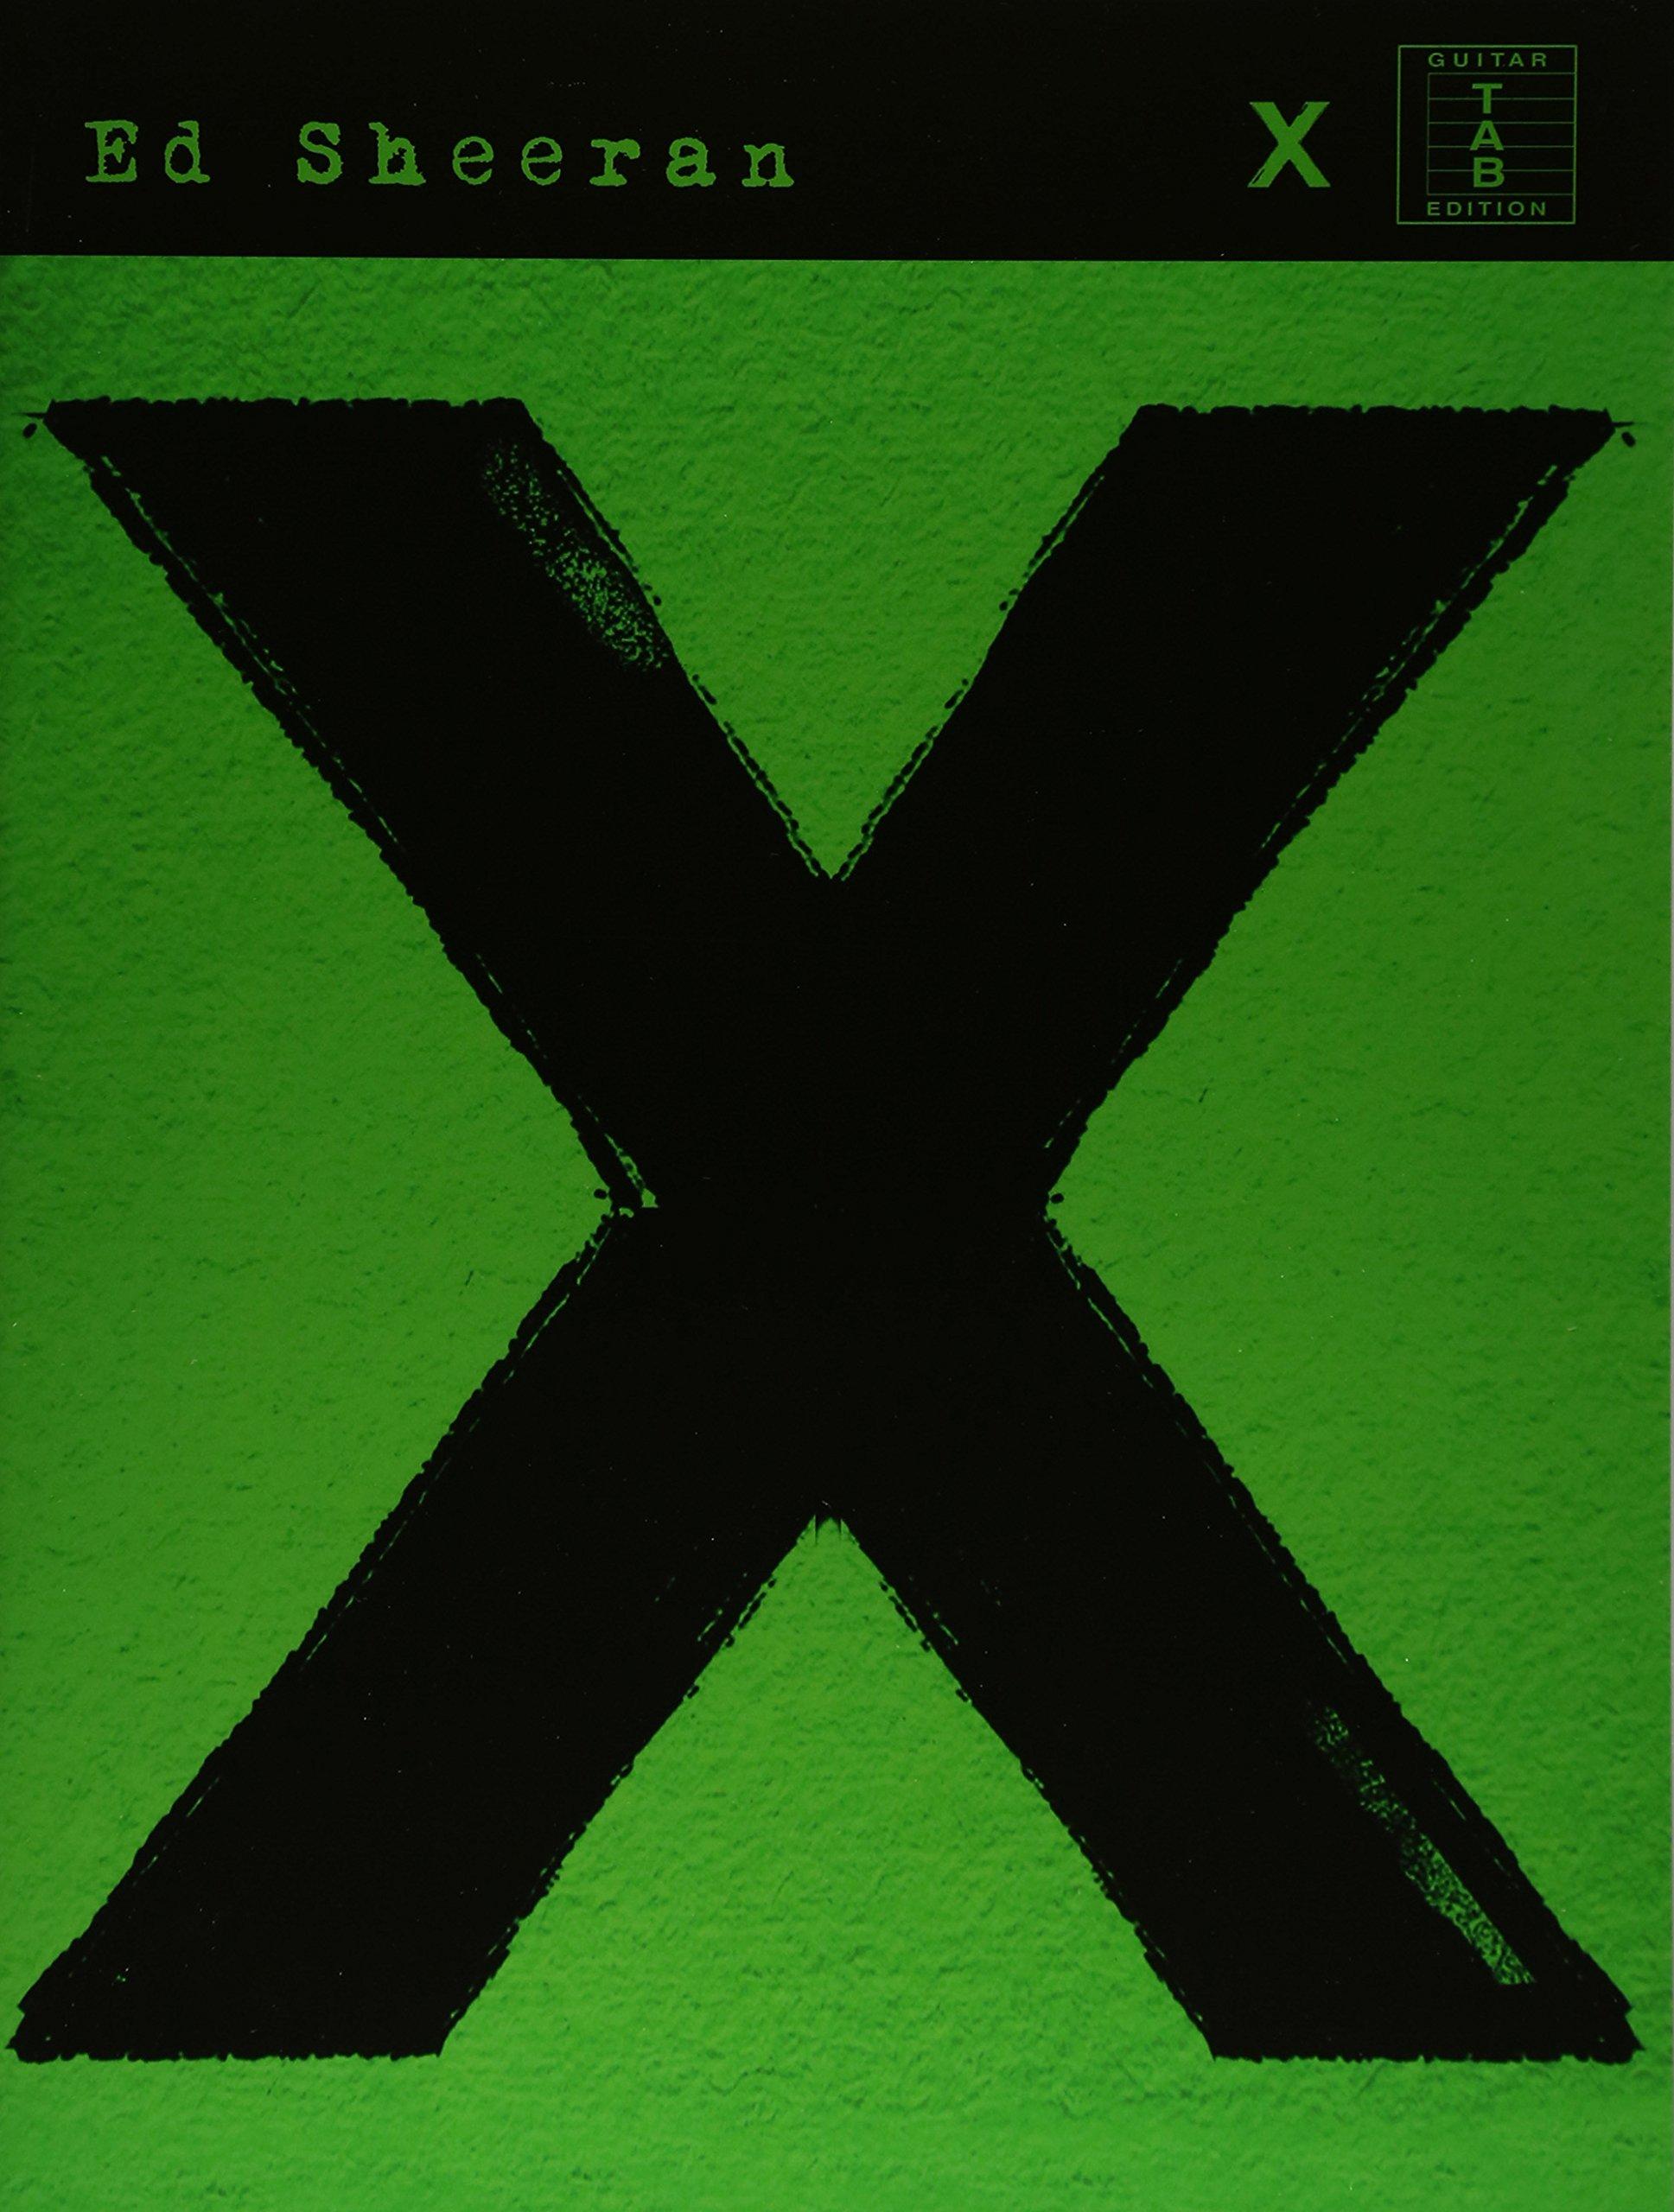 amazon ed sheeran x tab guitar tab ed sheeran opera